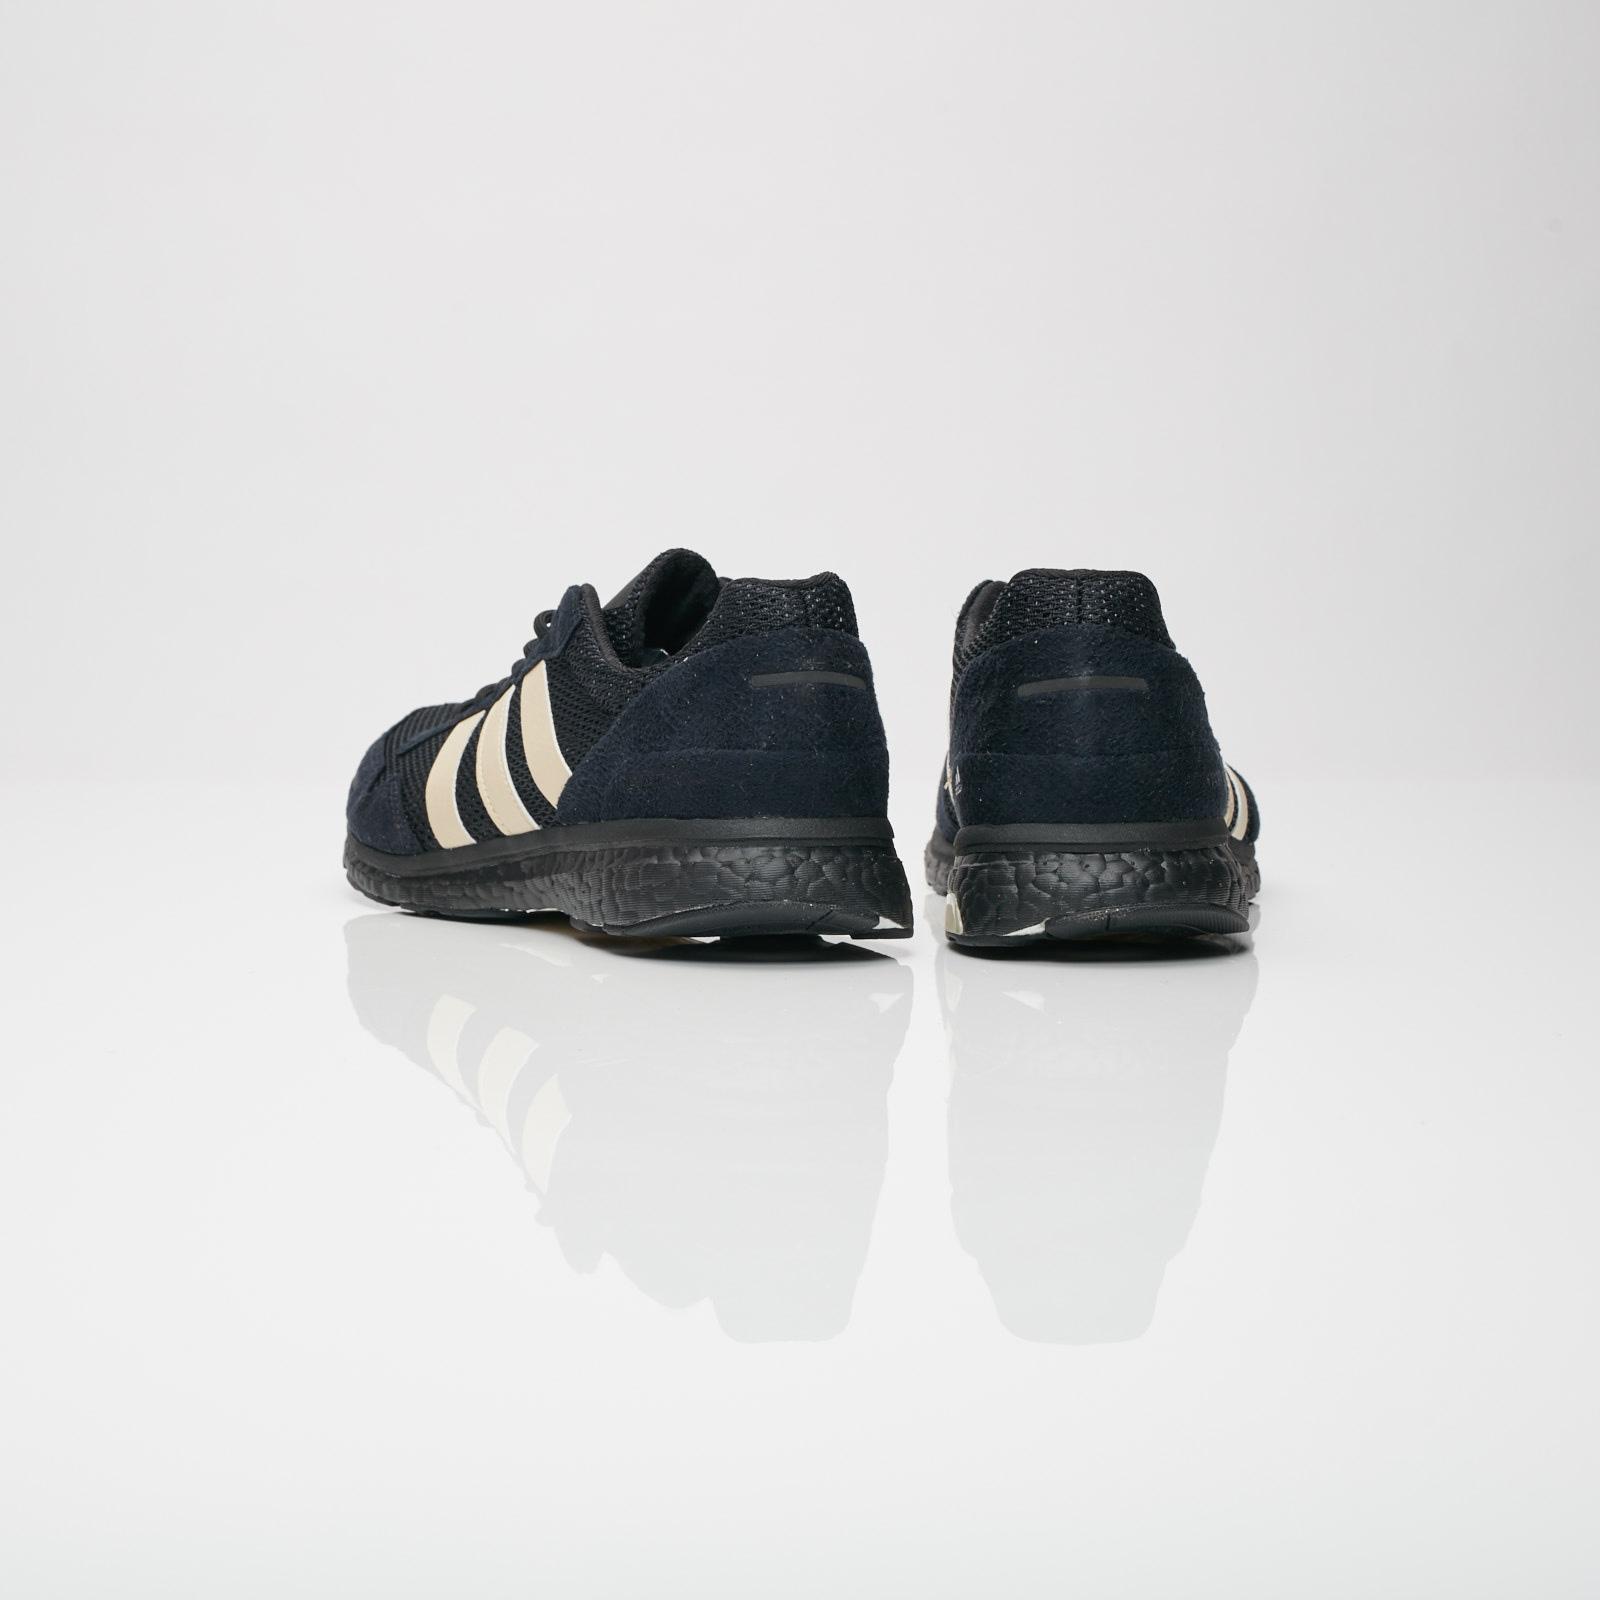 best service 66a1c 1dab7 adidas Adizero Adios 3 x UNDFTD - B22483 - Sneakersnstuff ...